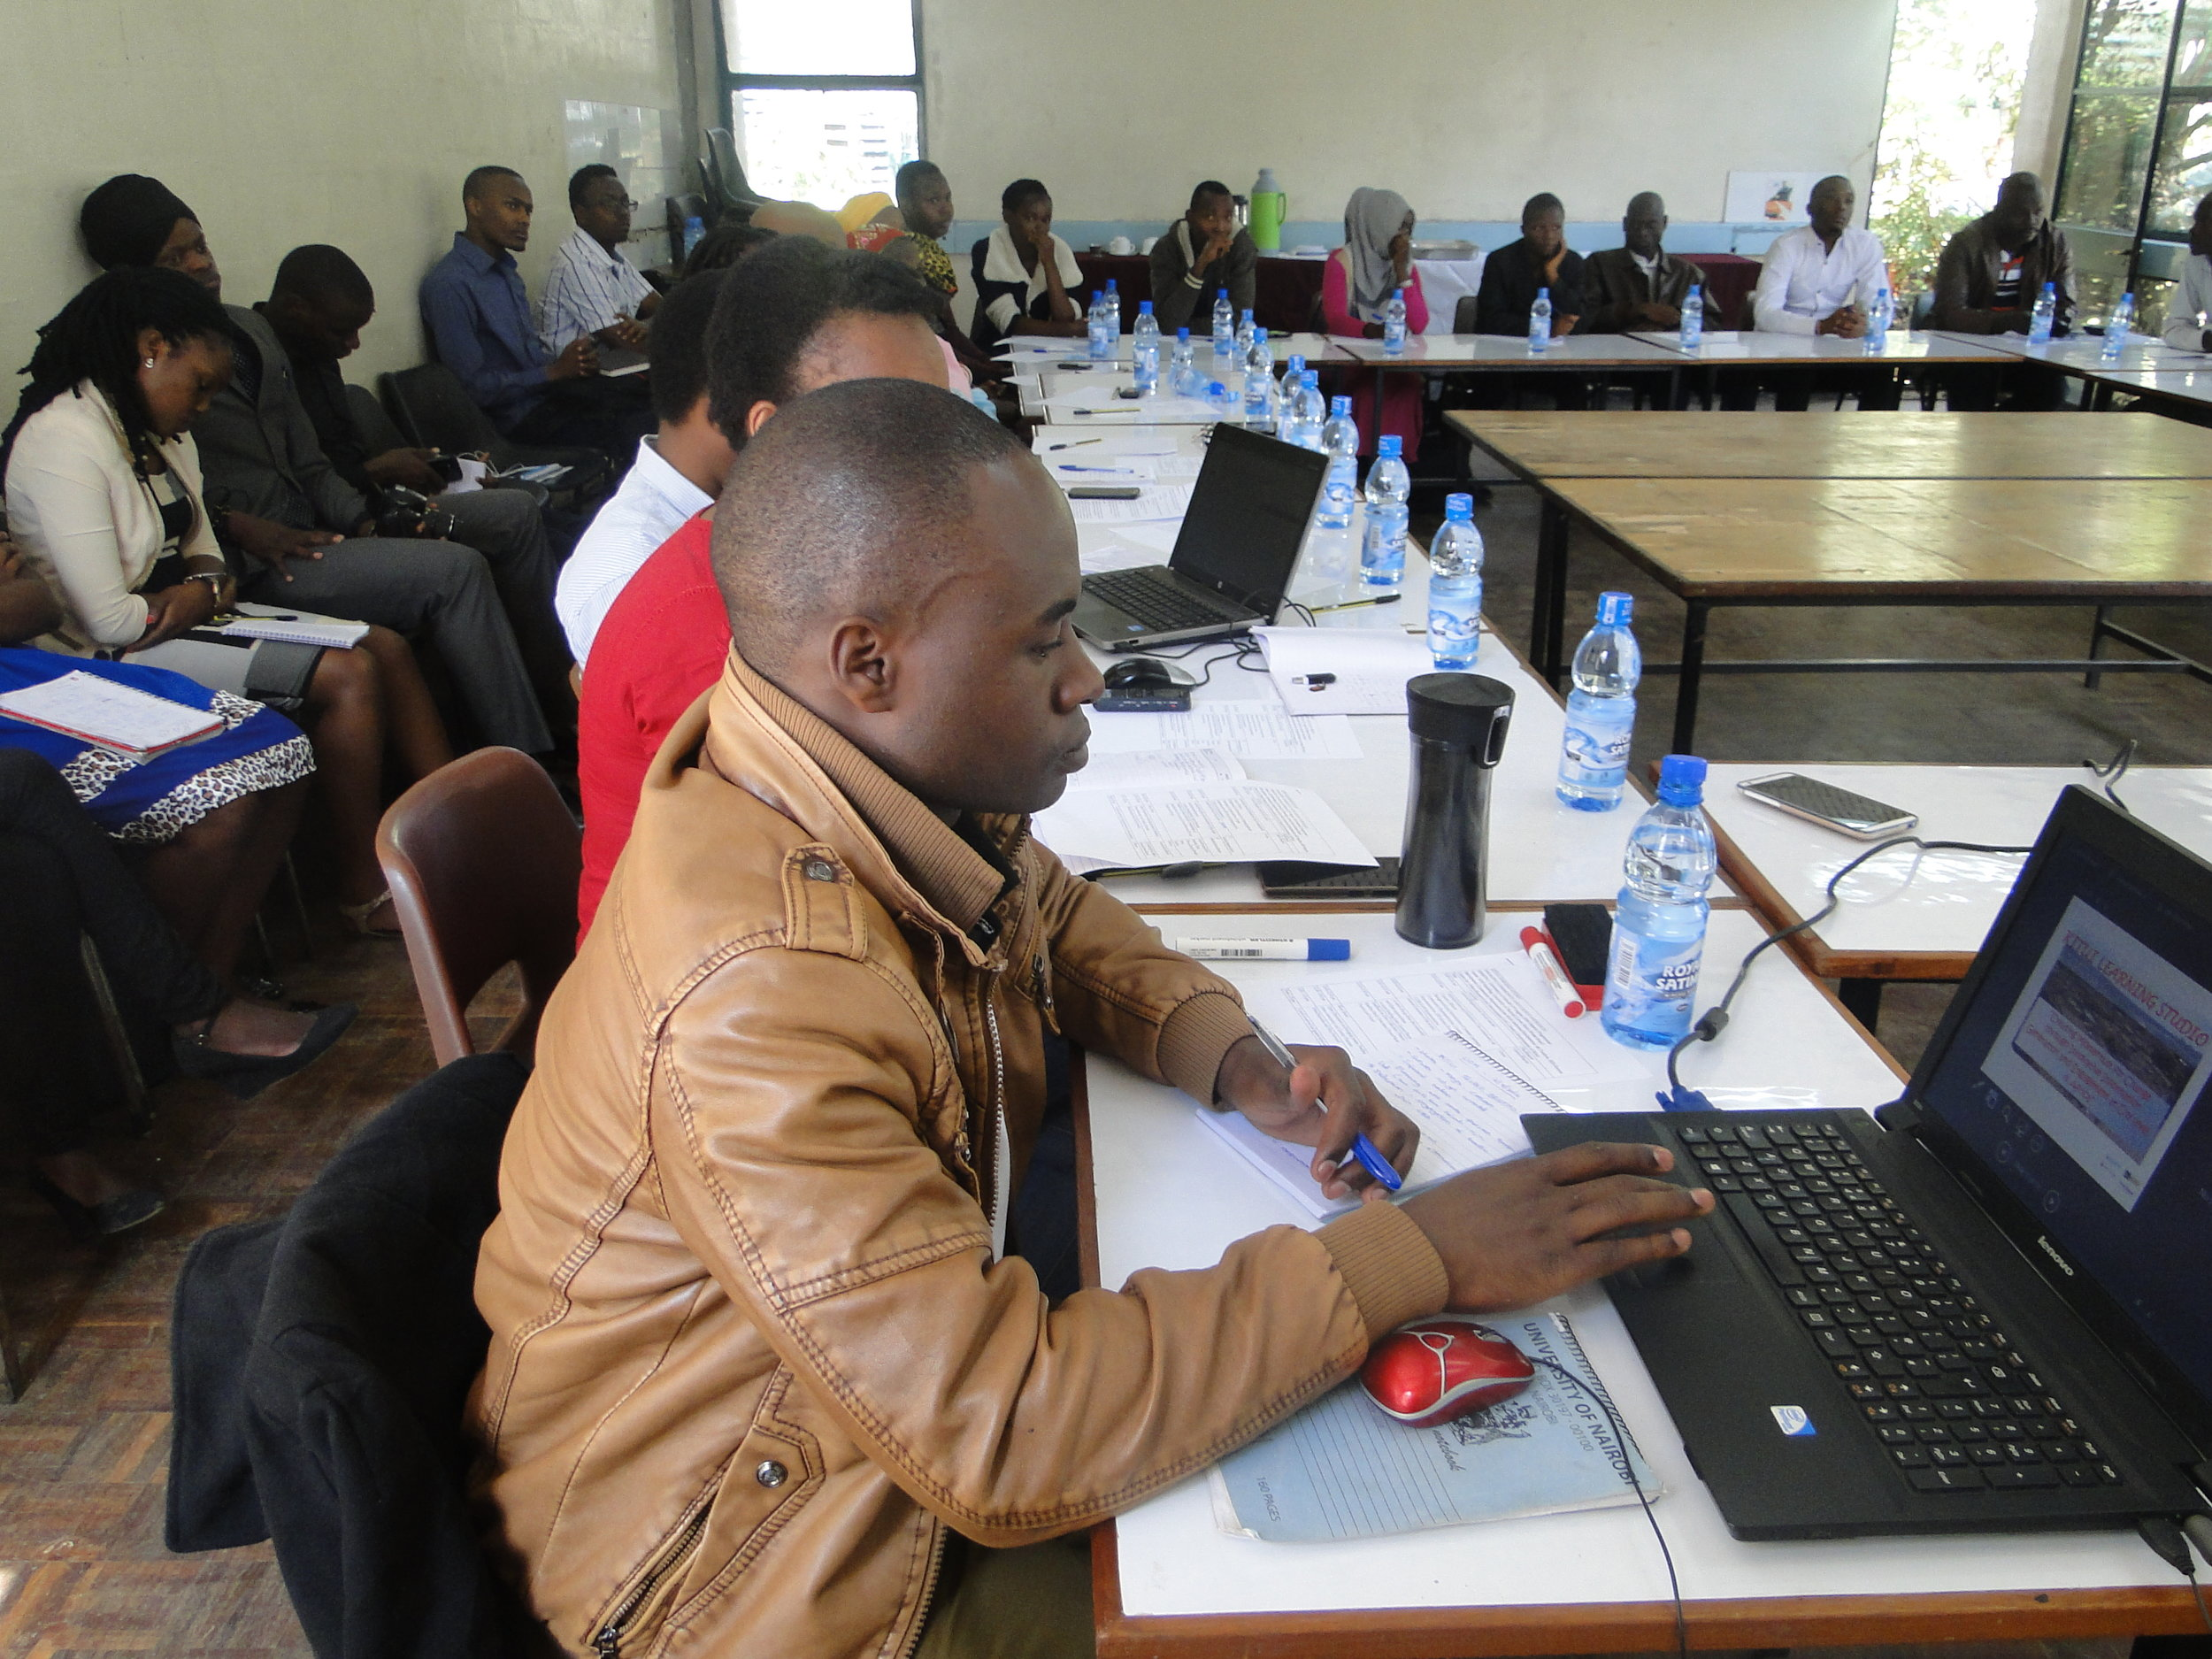 Kitui community workshop held at the University of Nairobi.